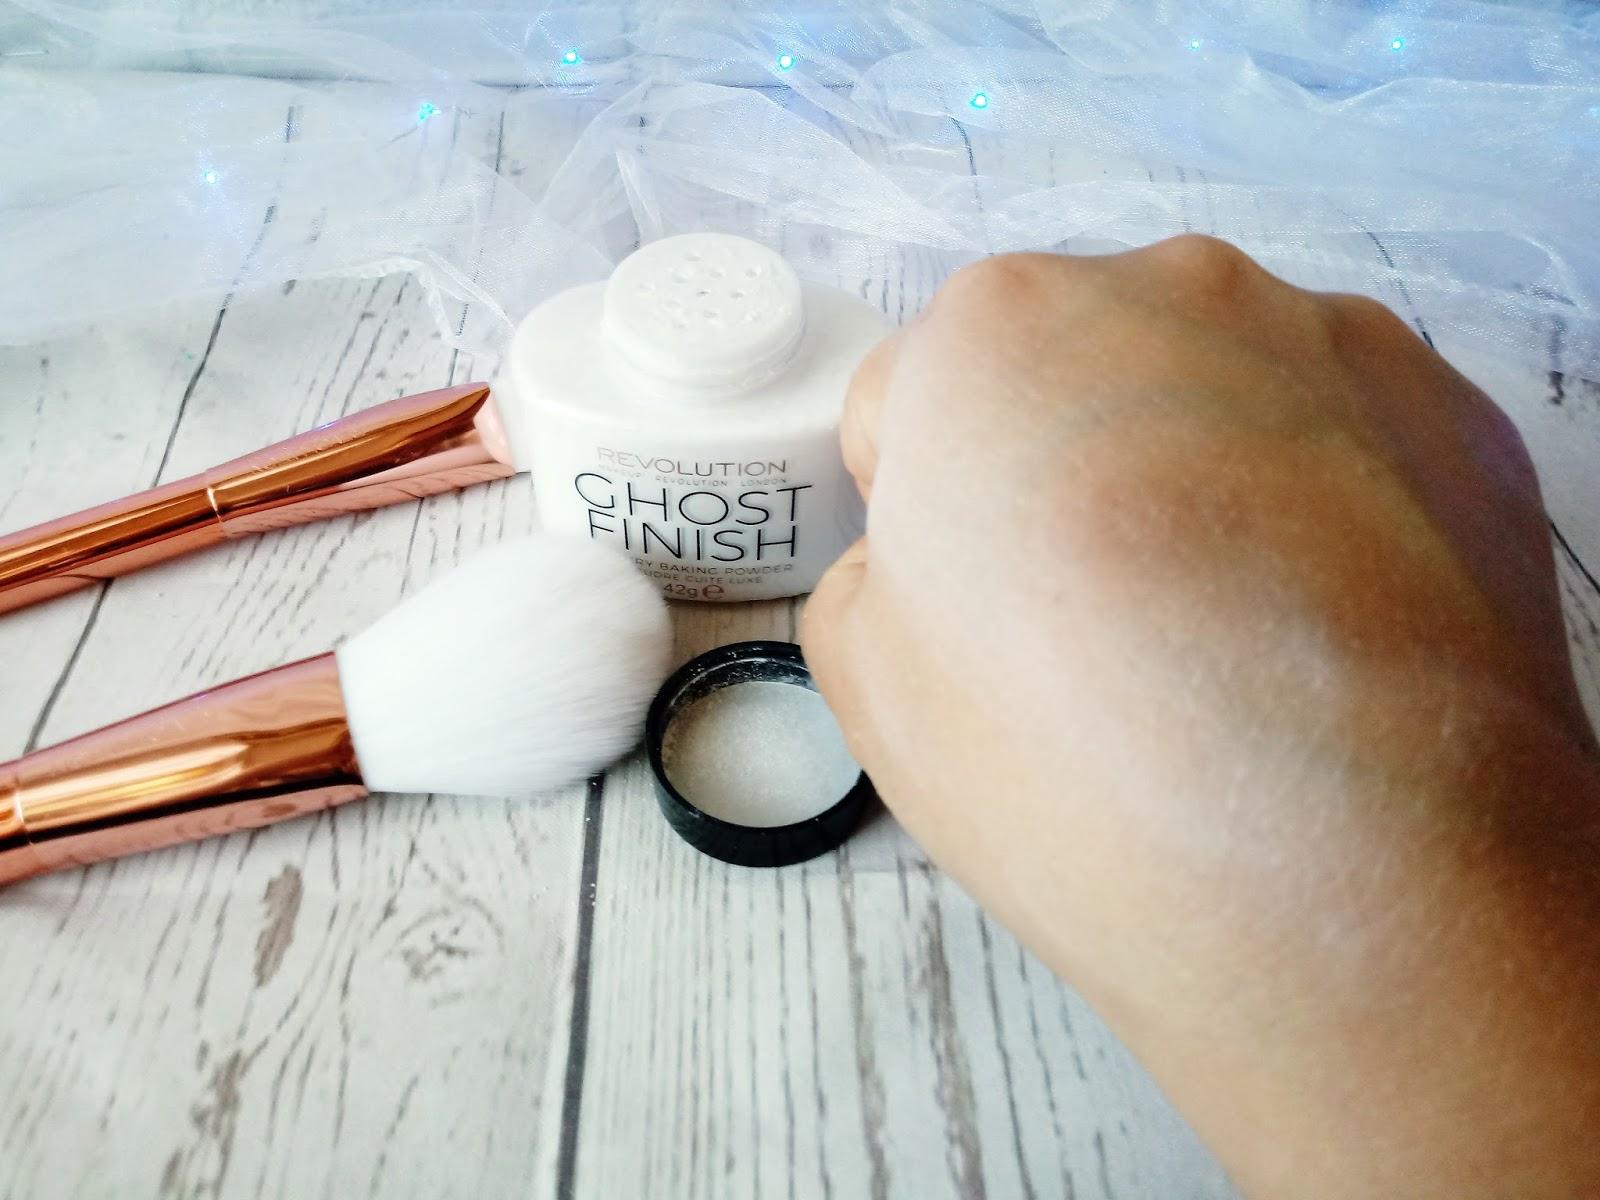 GHOST FINISH Makeup Revolution